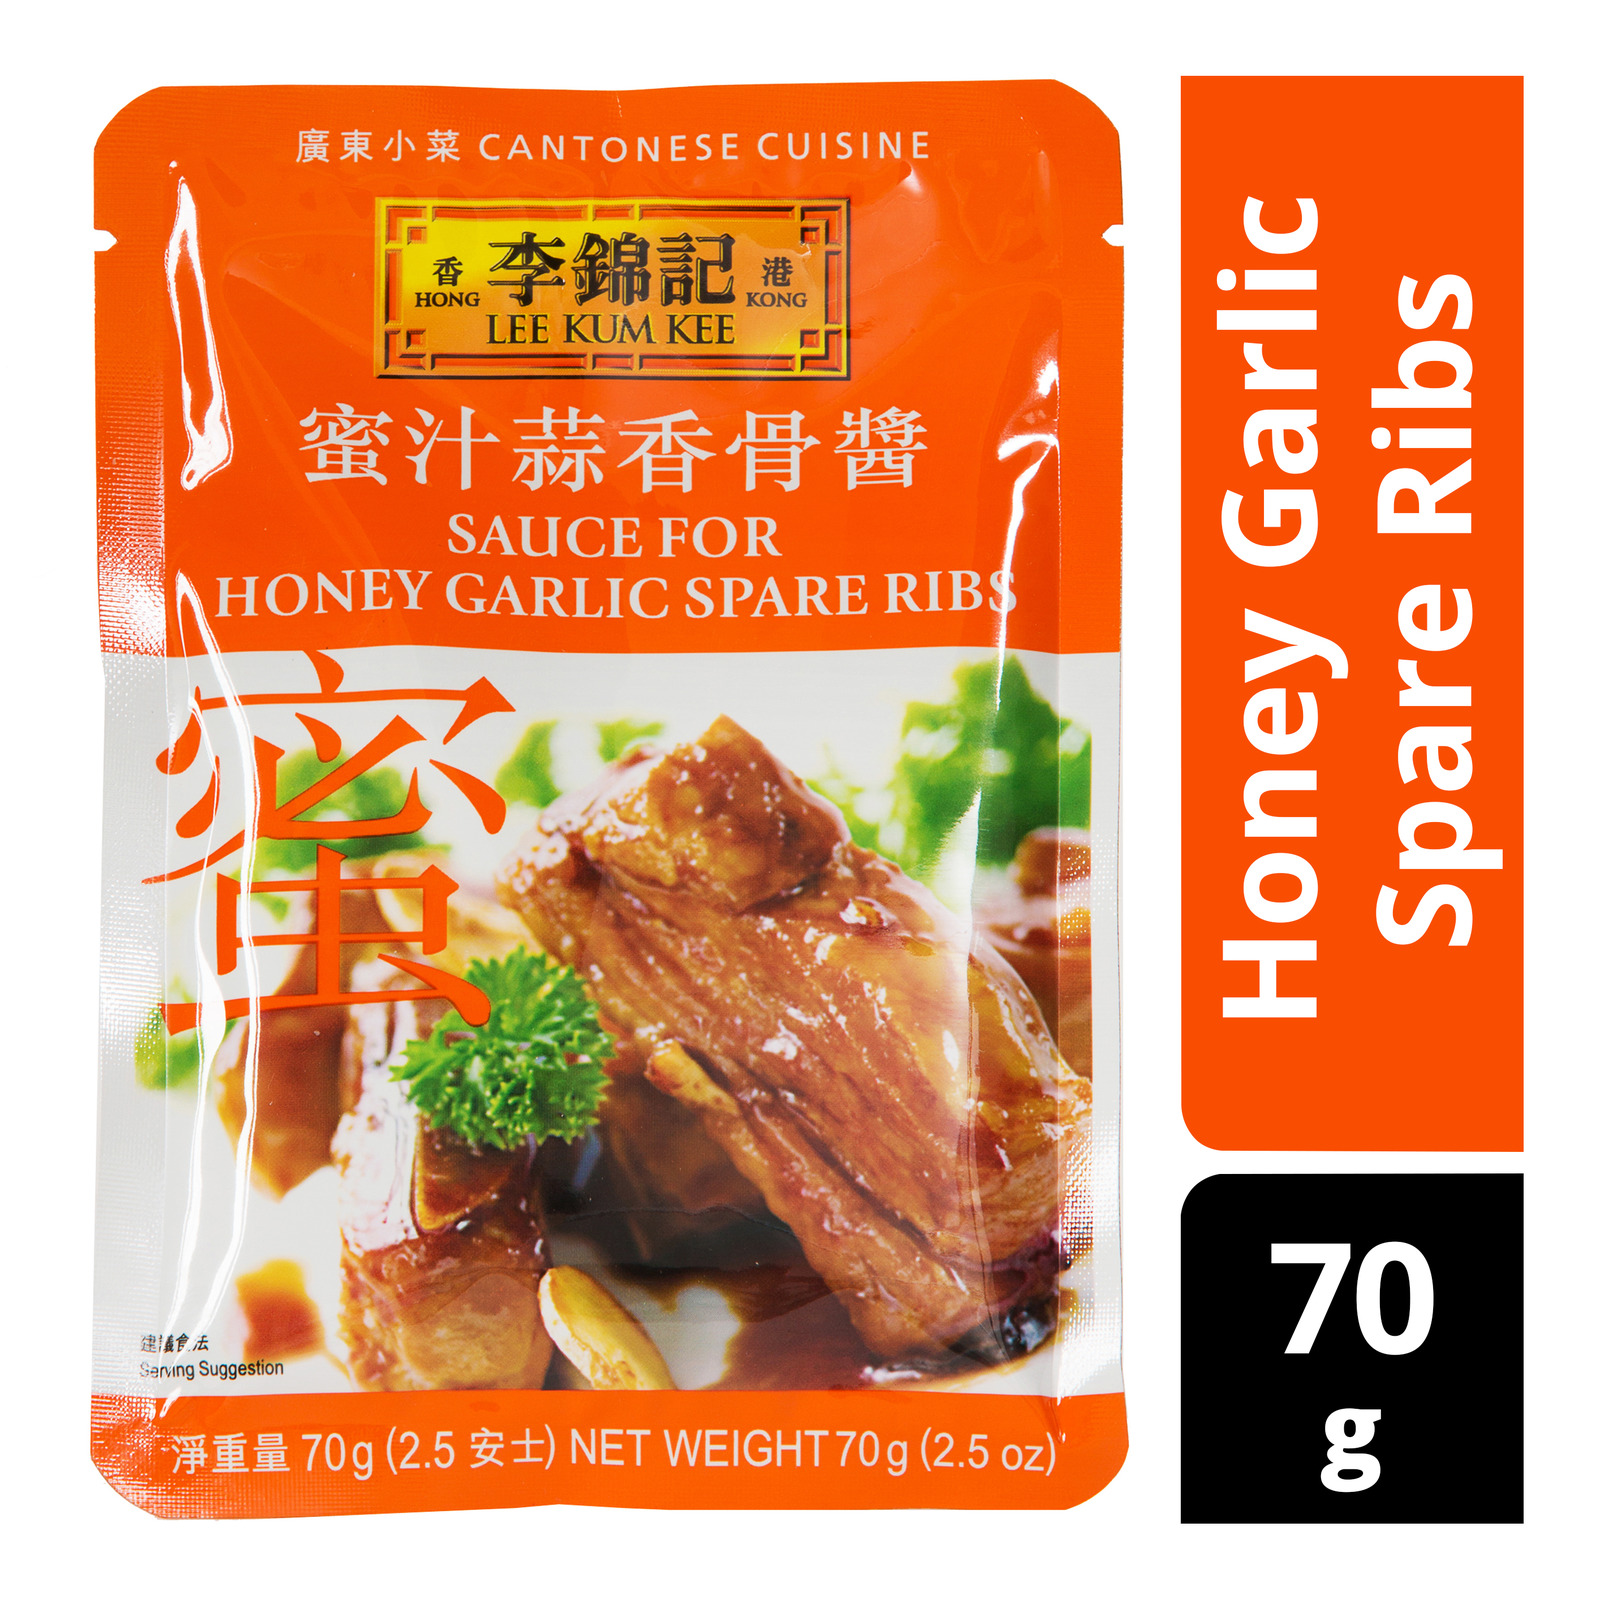 Lee Kum Kee Sauce - Honey Garlic Spare Ribs